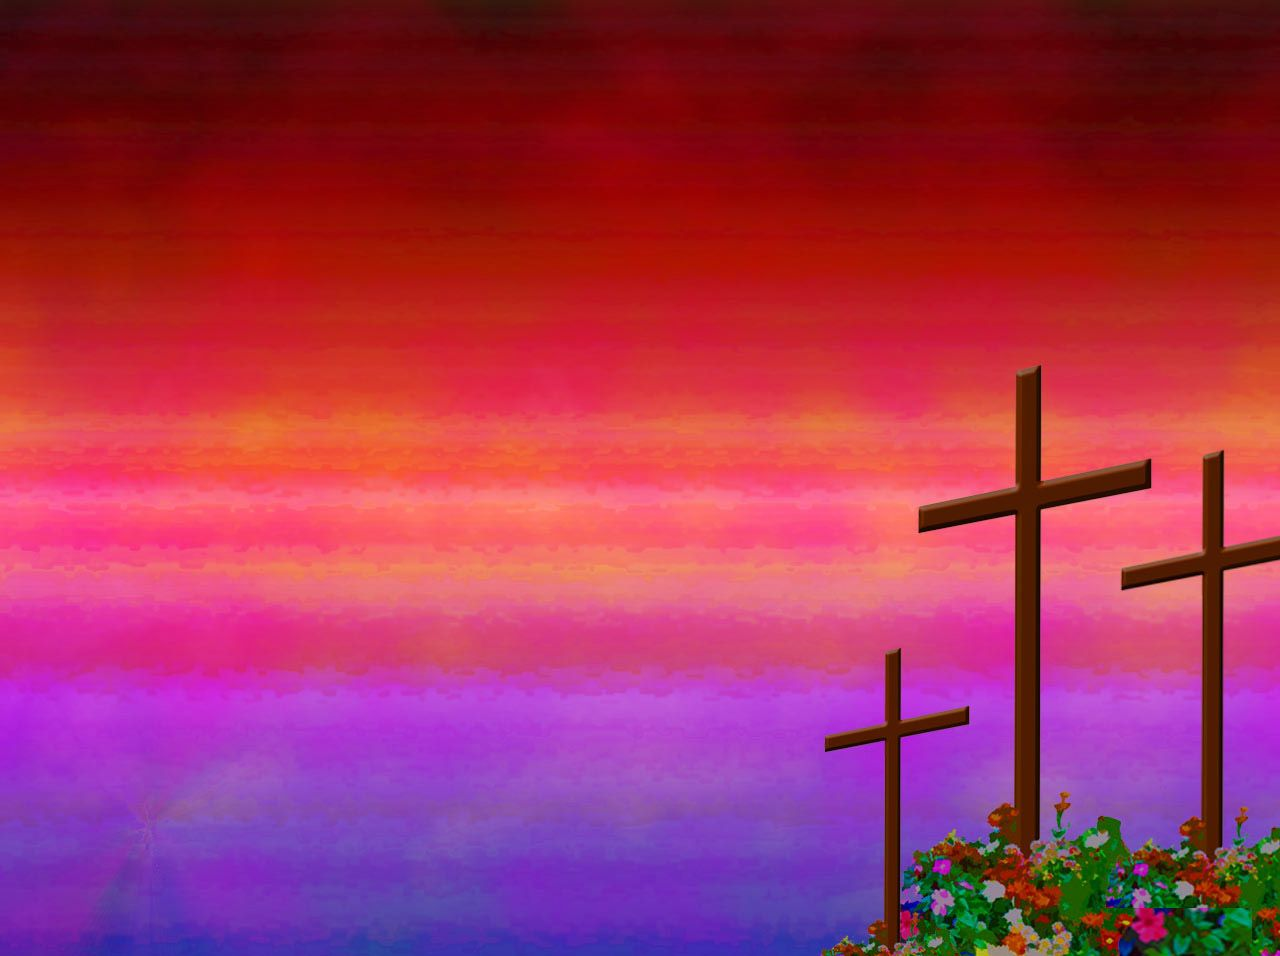 Christian Rose Garden Powerpoint Background. In